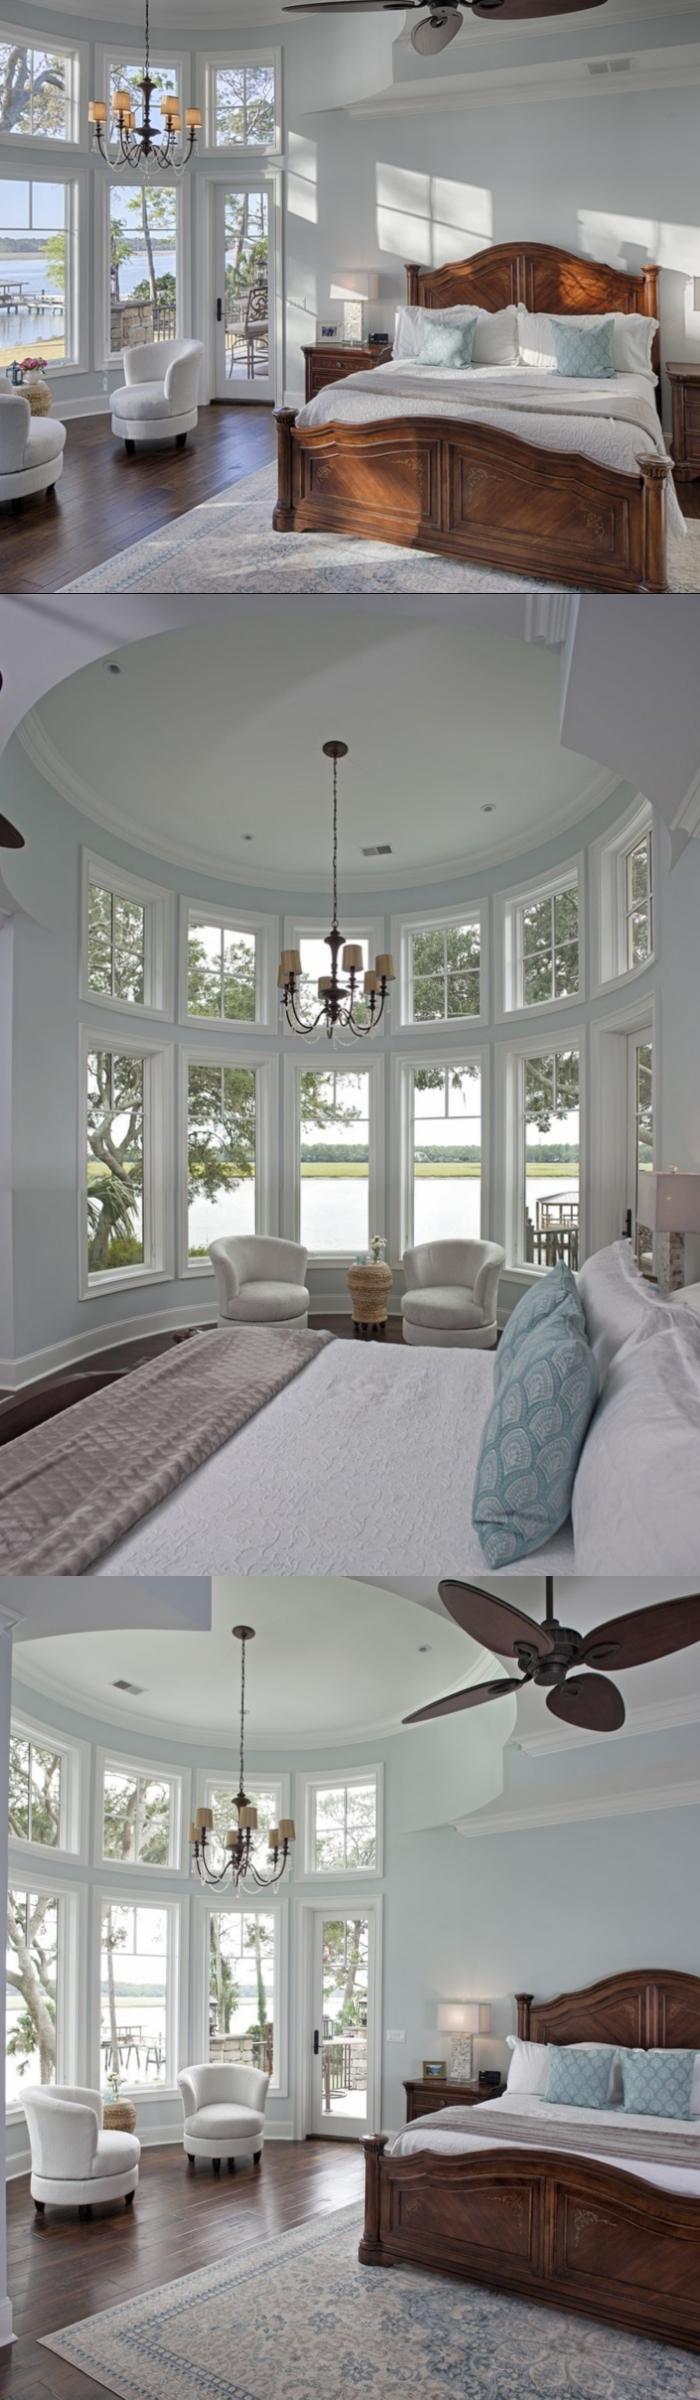 Traditional Bay Window Bedroom